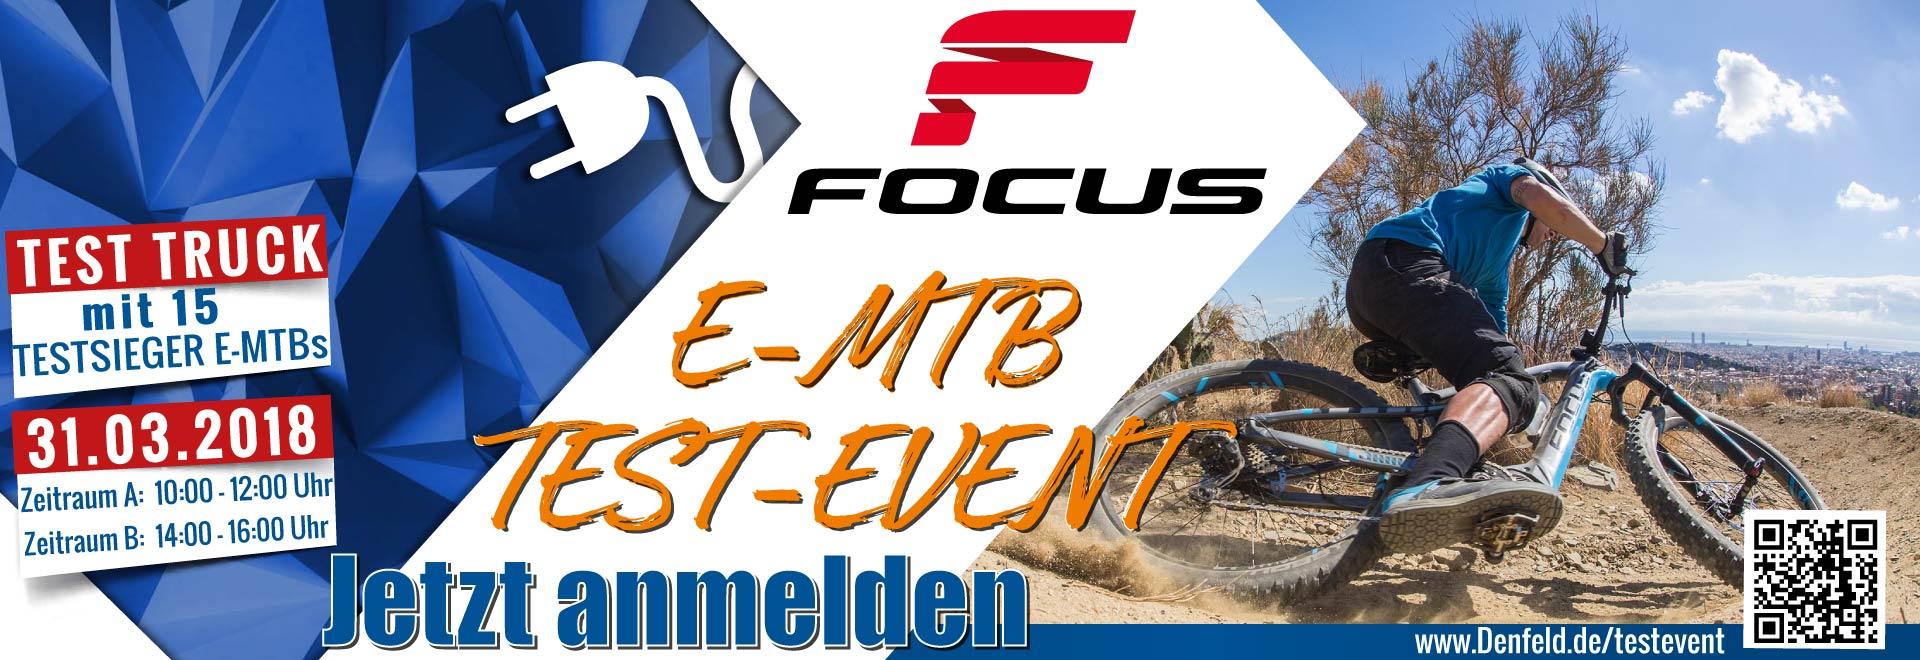 Focus² E-MTB Testevent